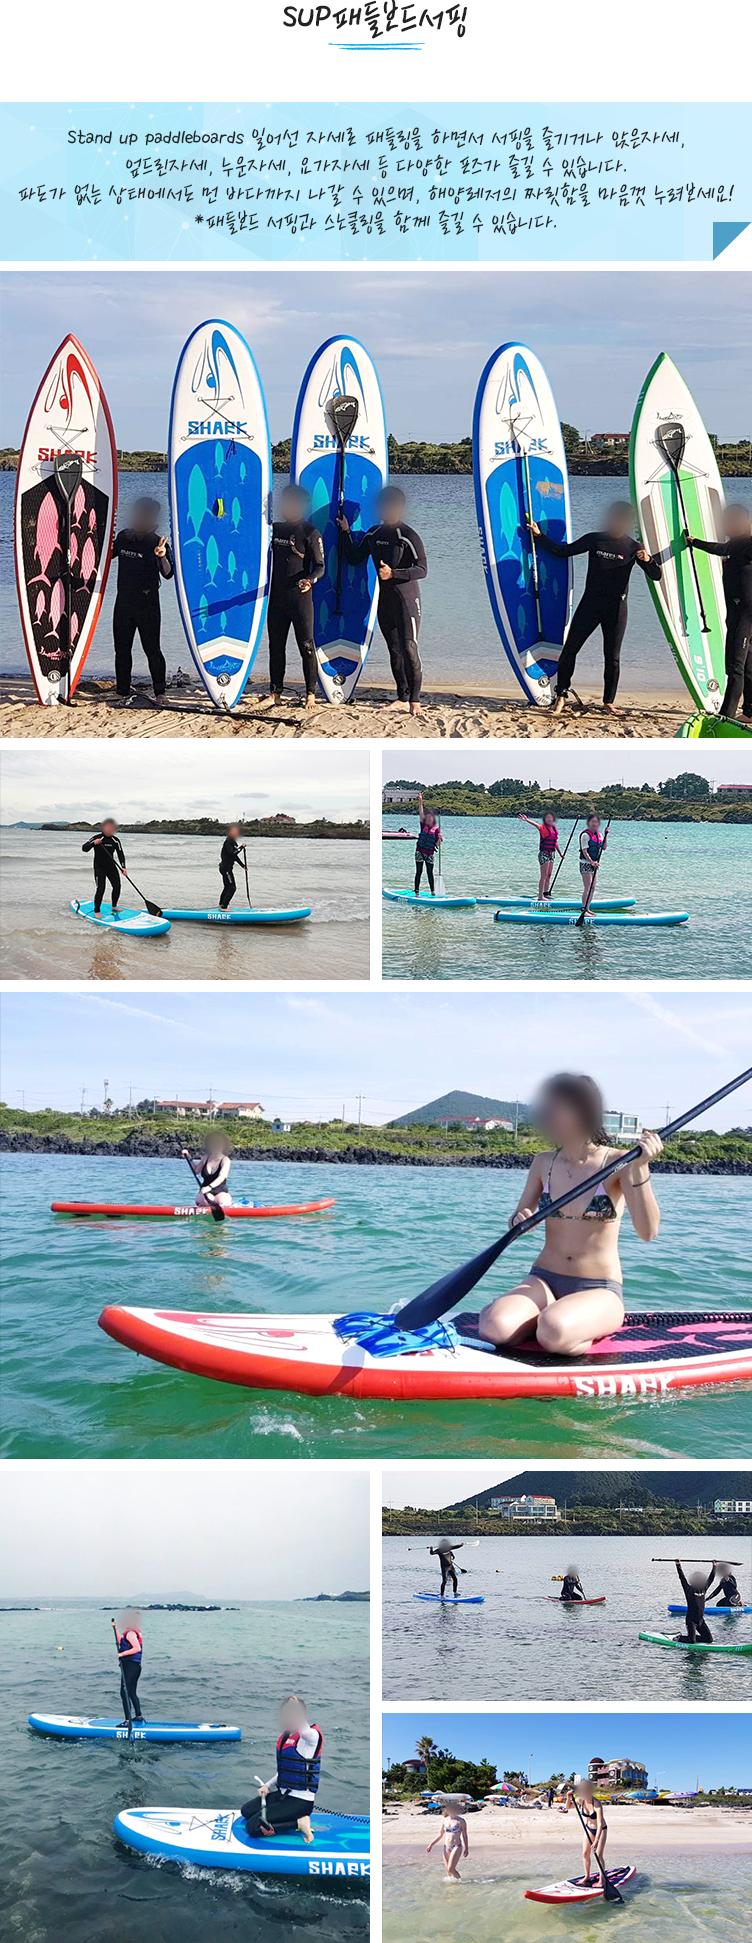 sup패들보드 서핑.png